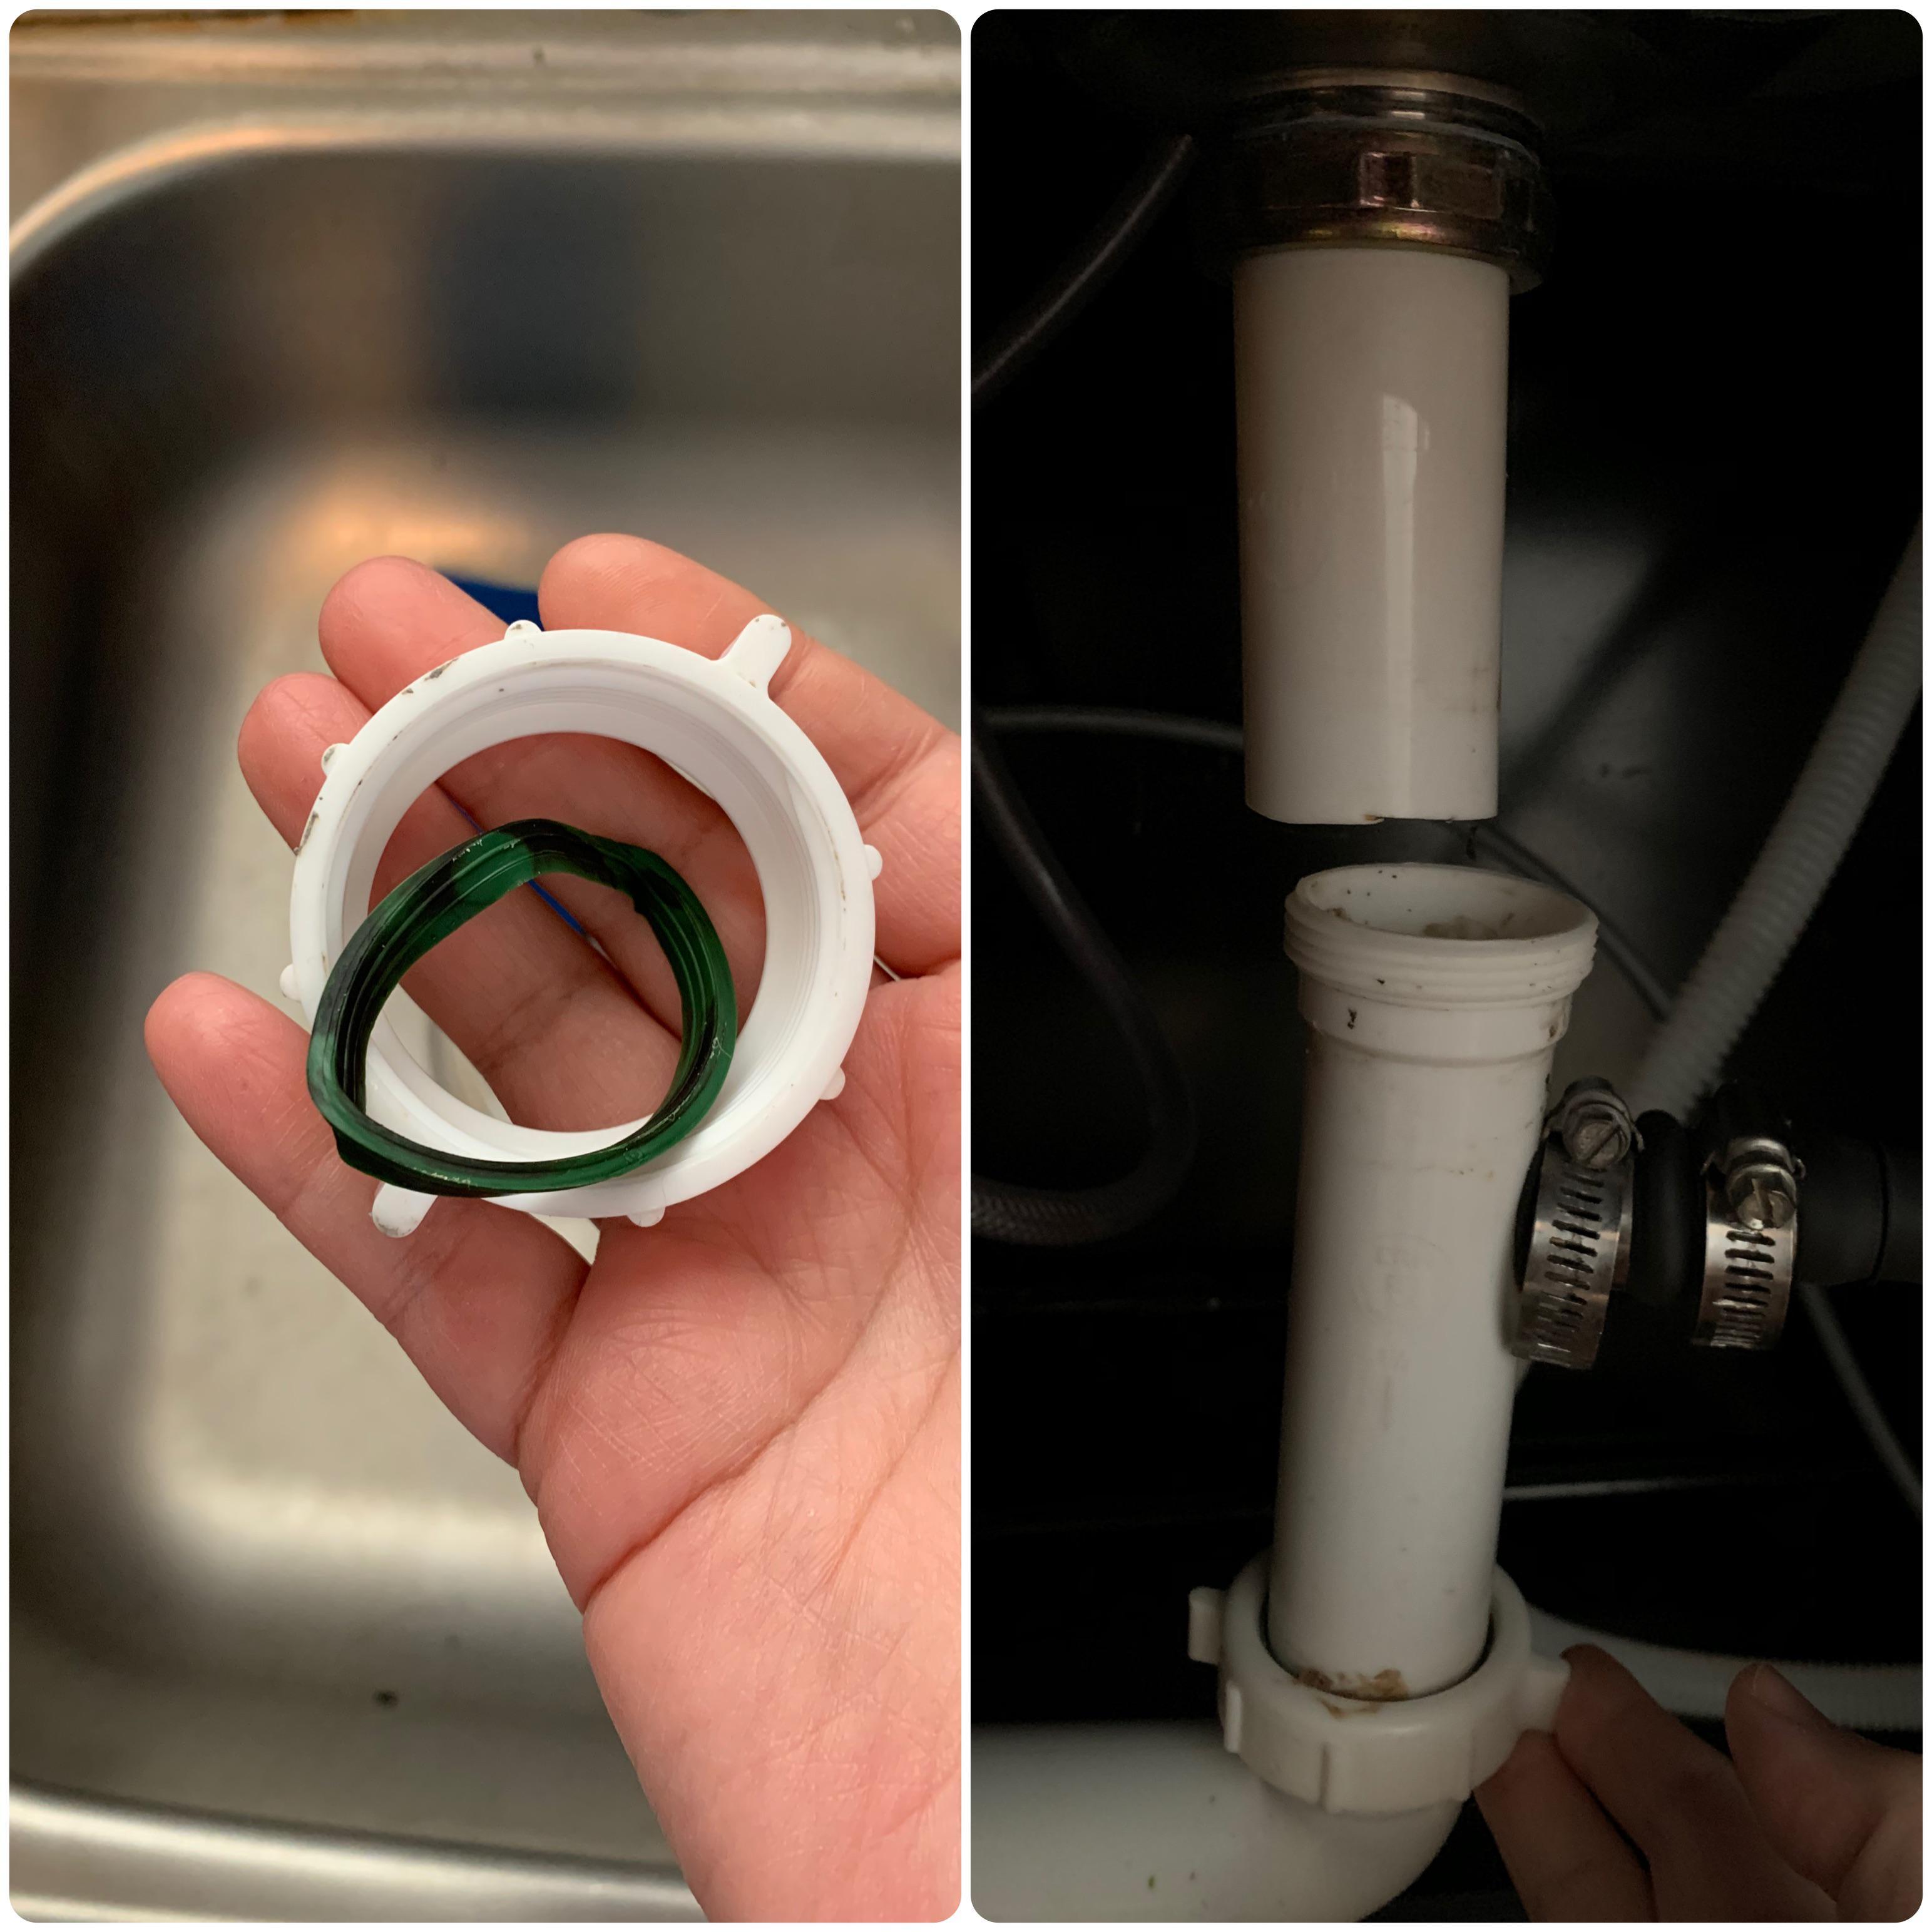 drain for my kitchen sink began leaking